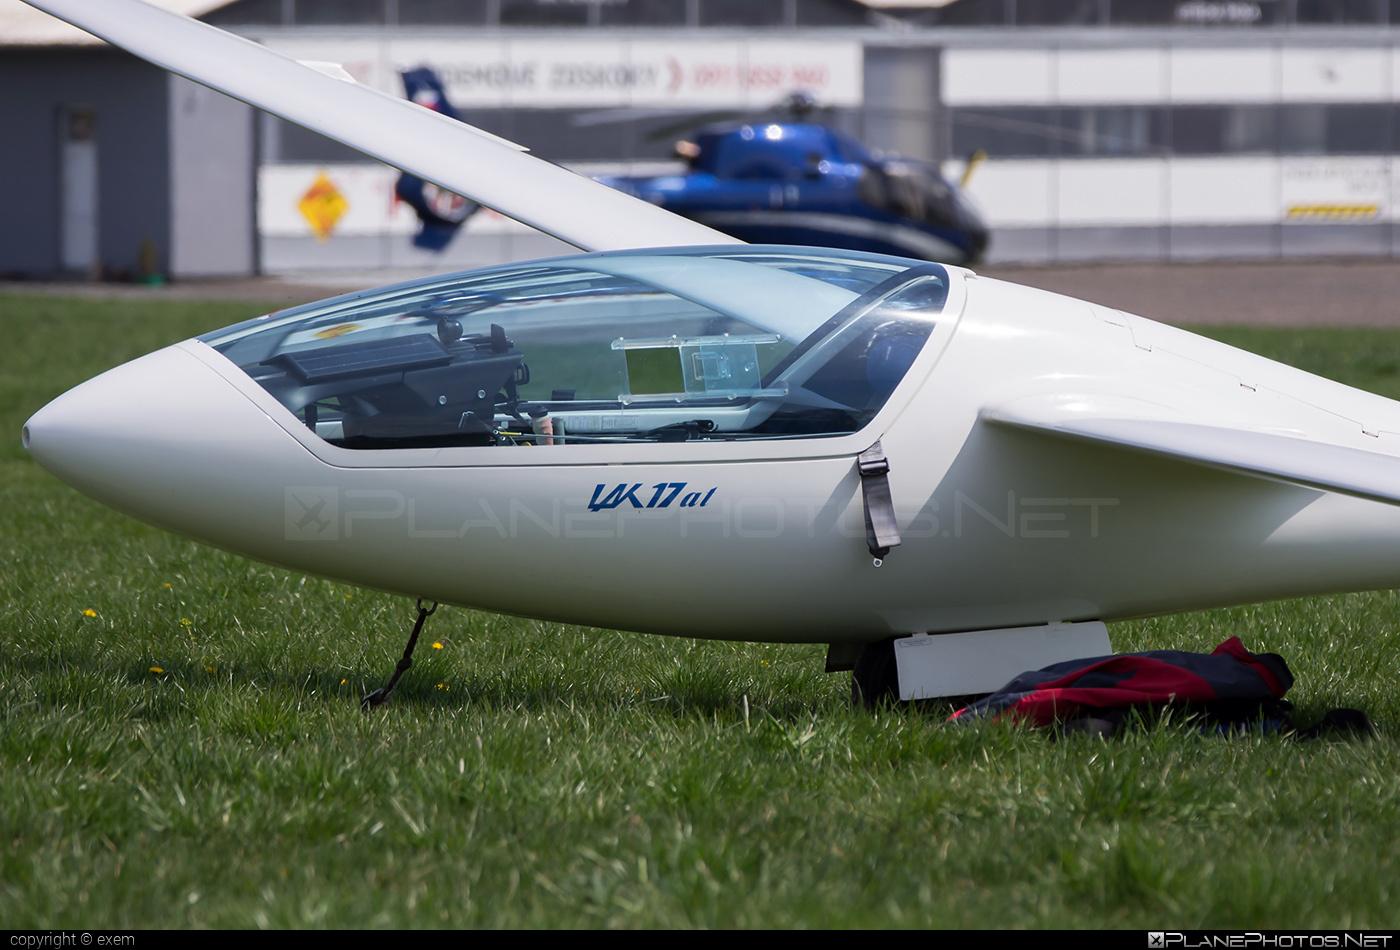 Sportine Aviacija LAK-17AT - OM-0717 operated by Private operator #sportineaviacija